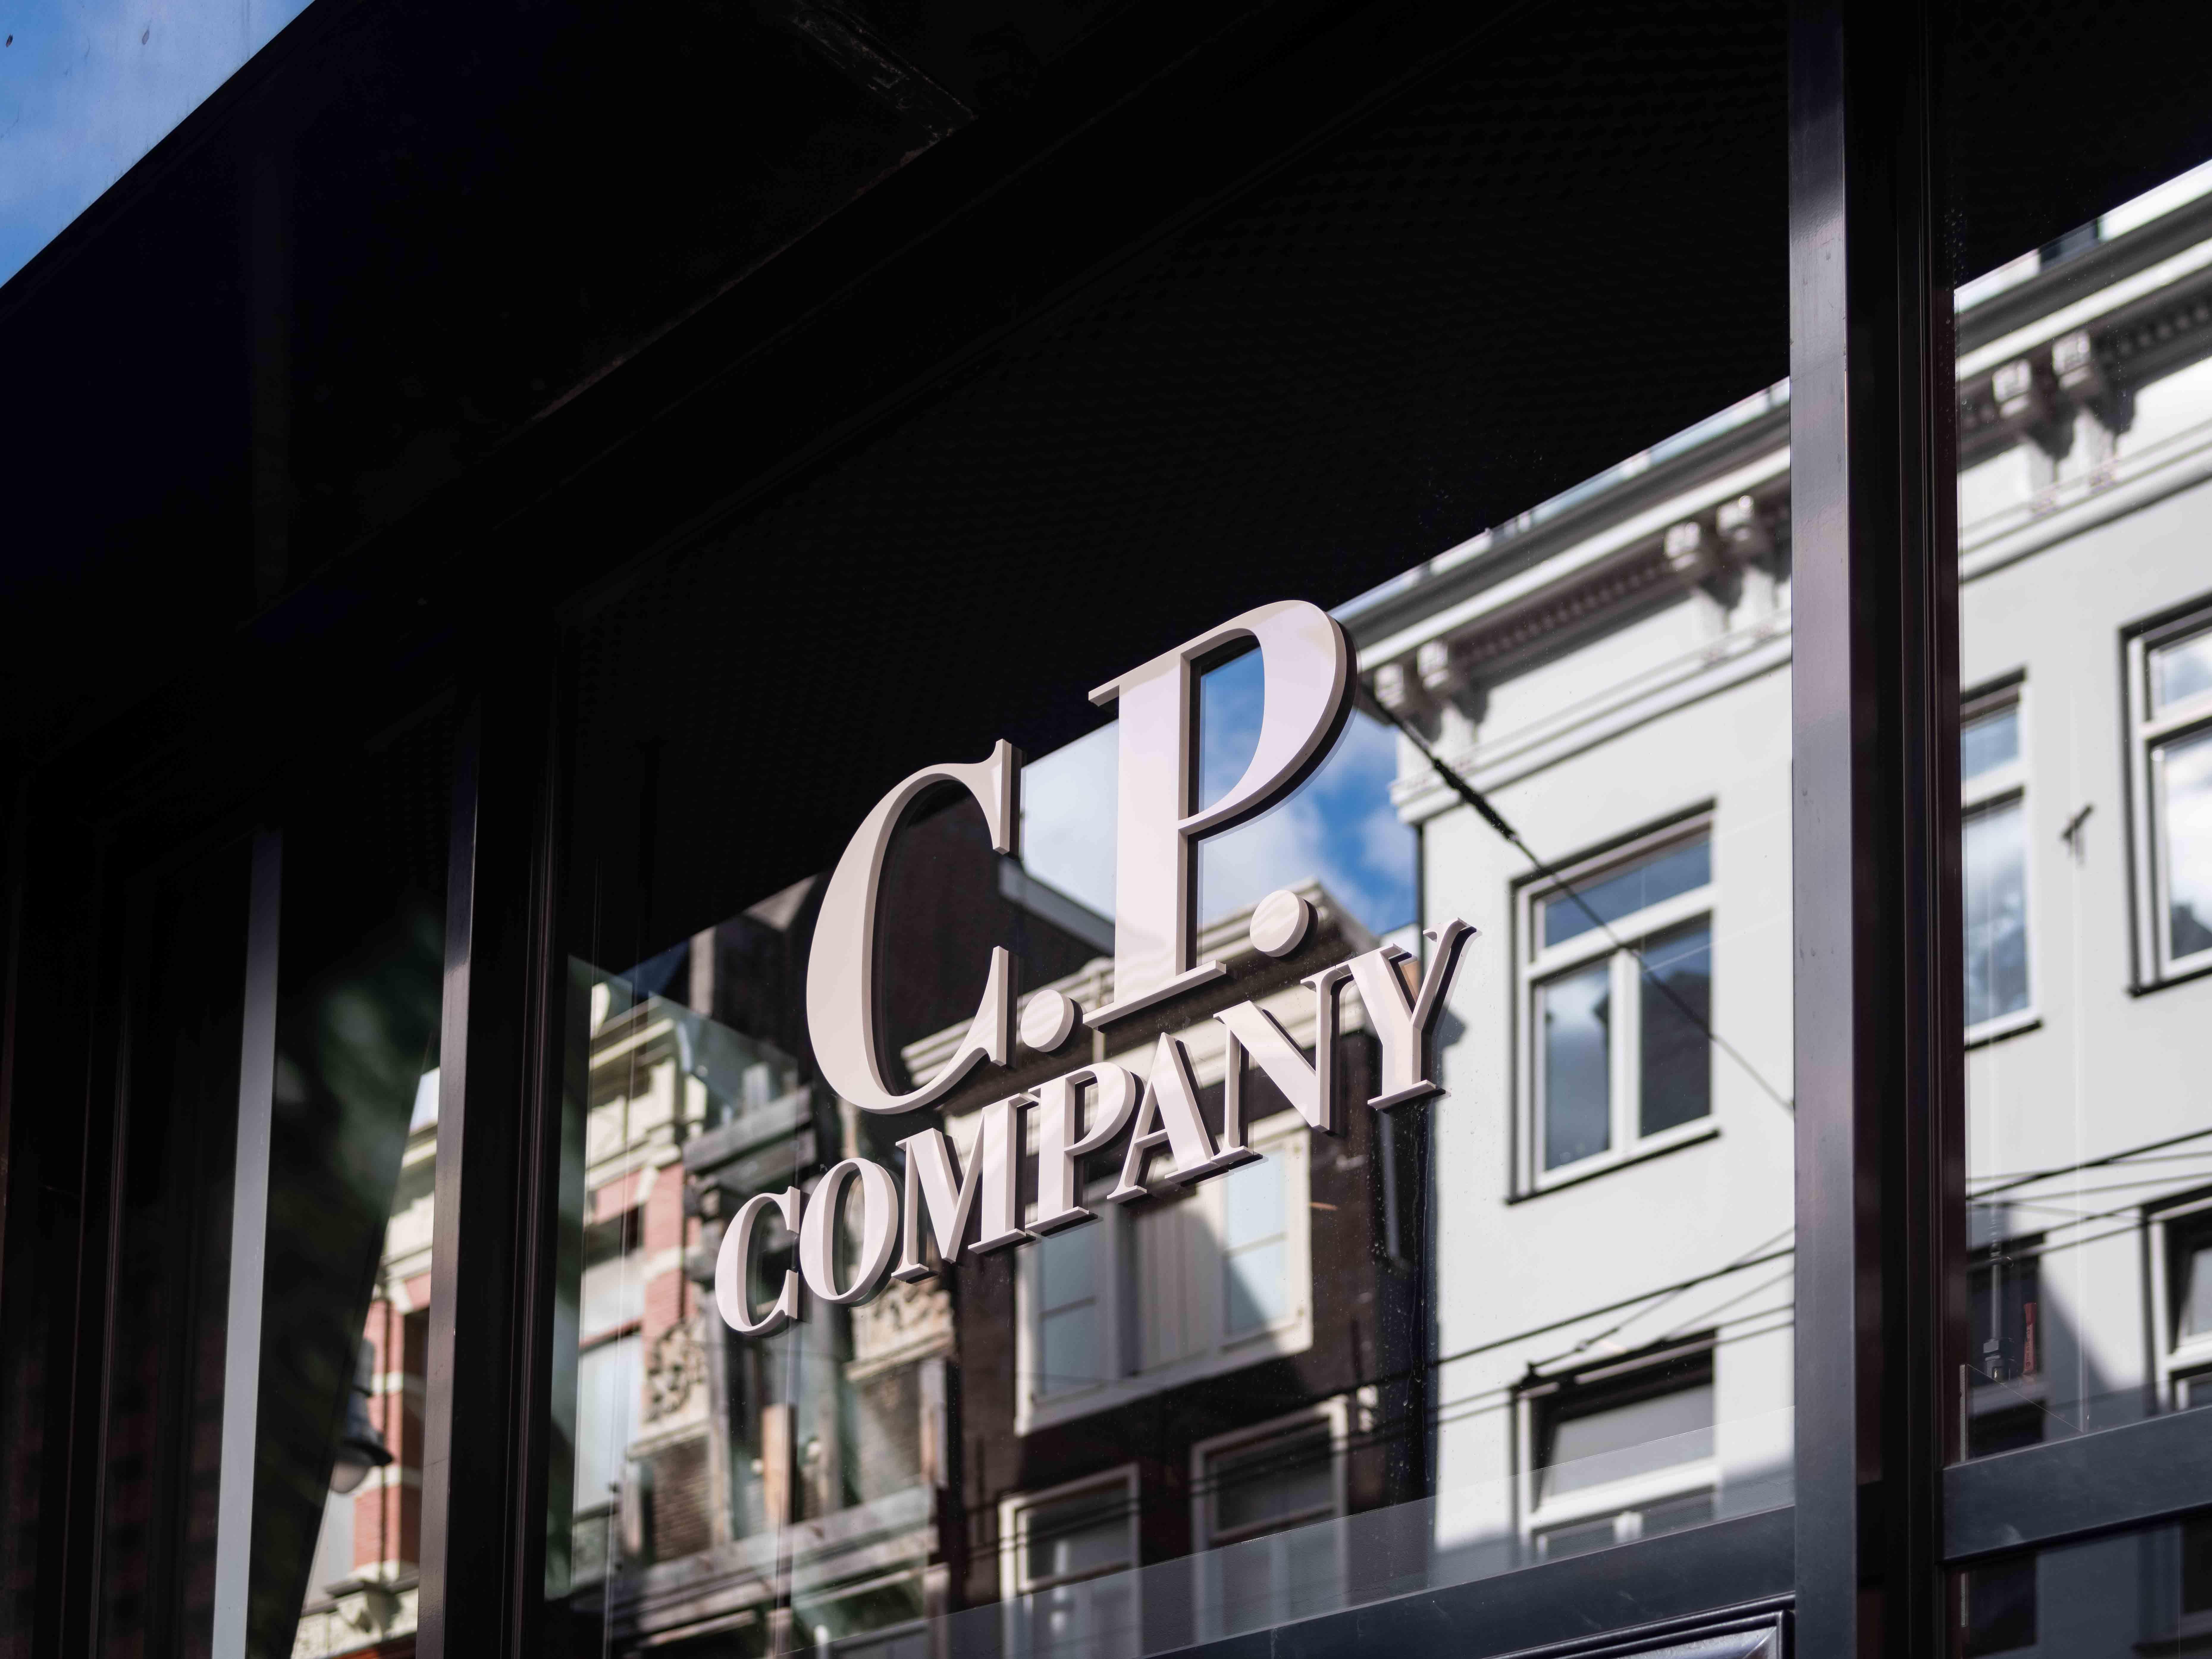 cp-company-opens-in-amsterdam